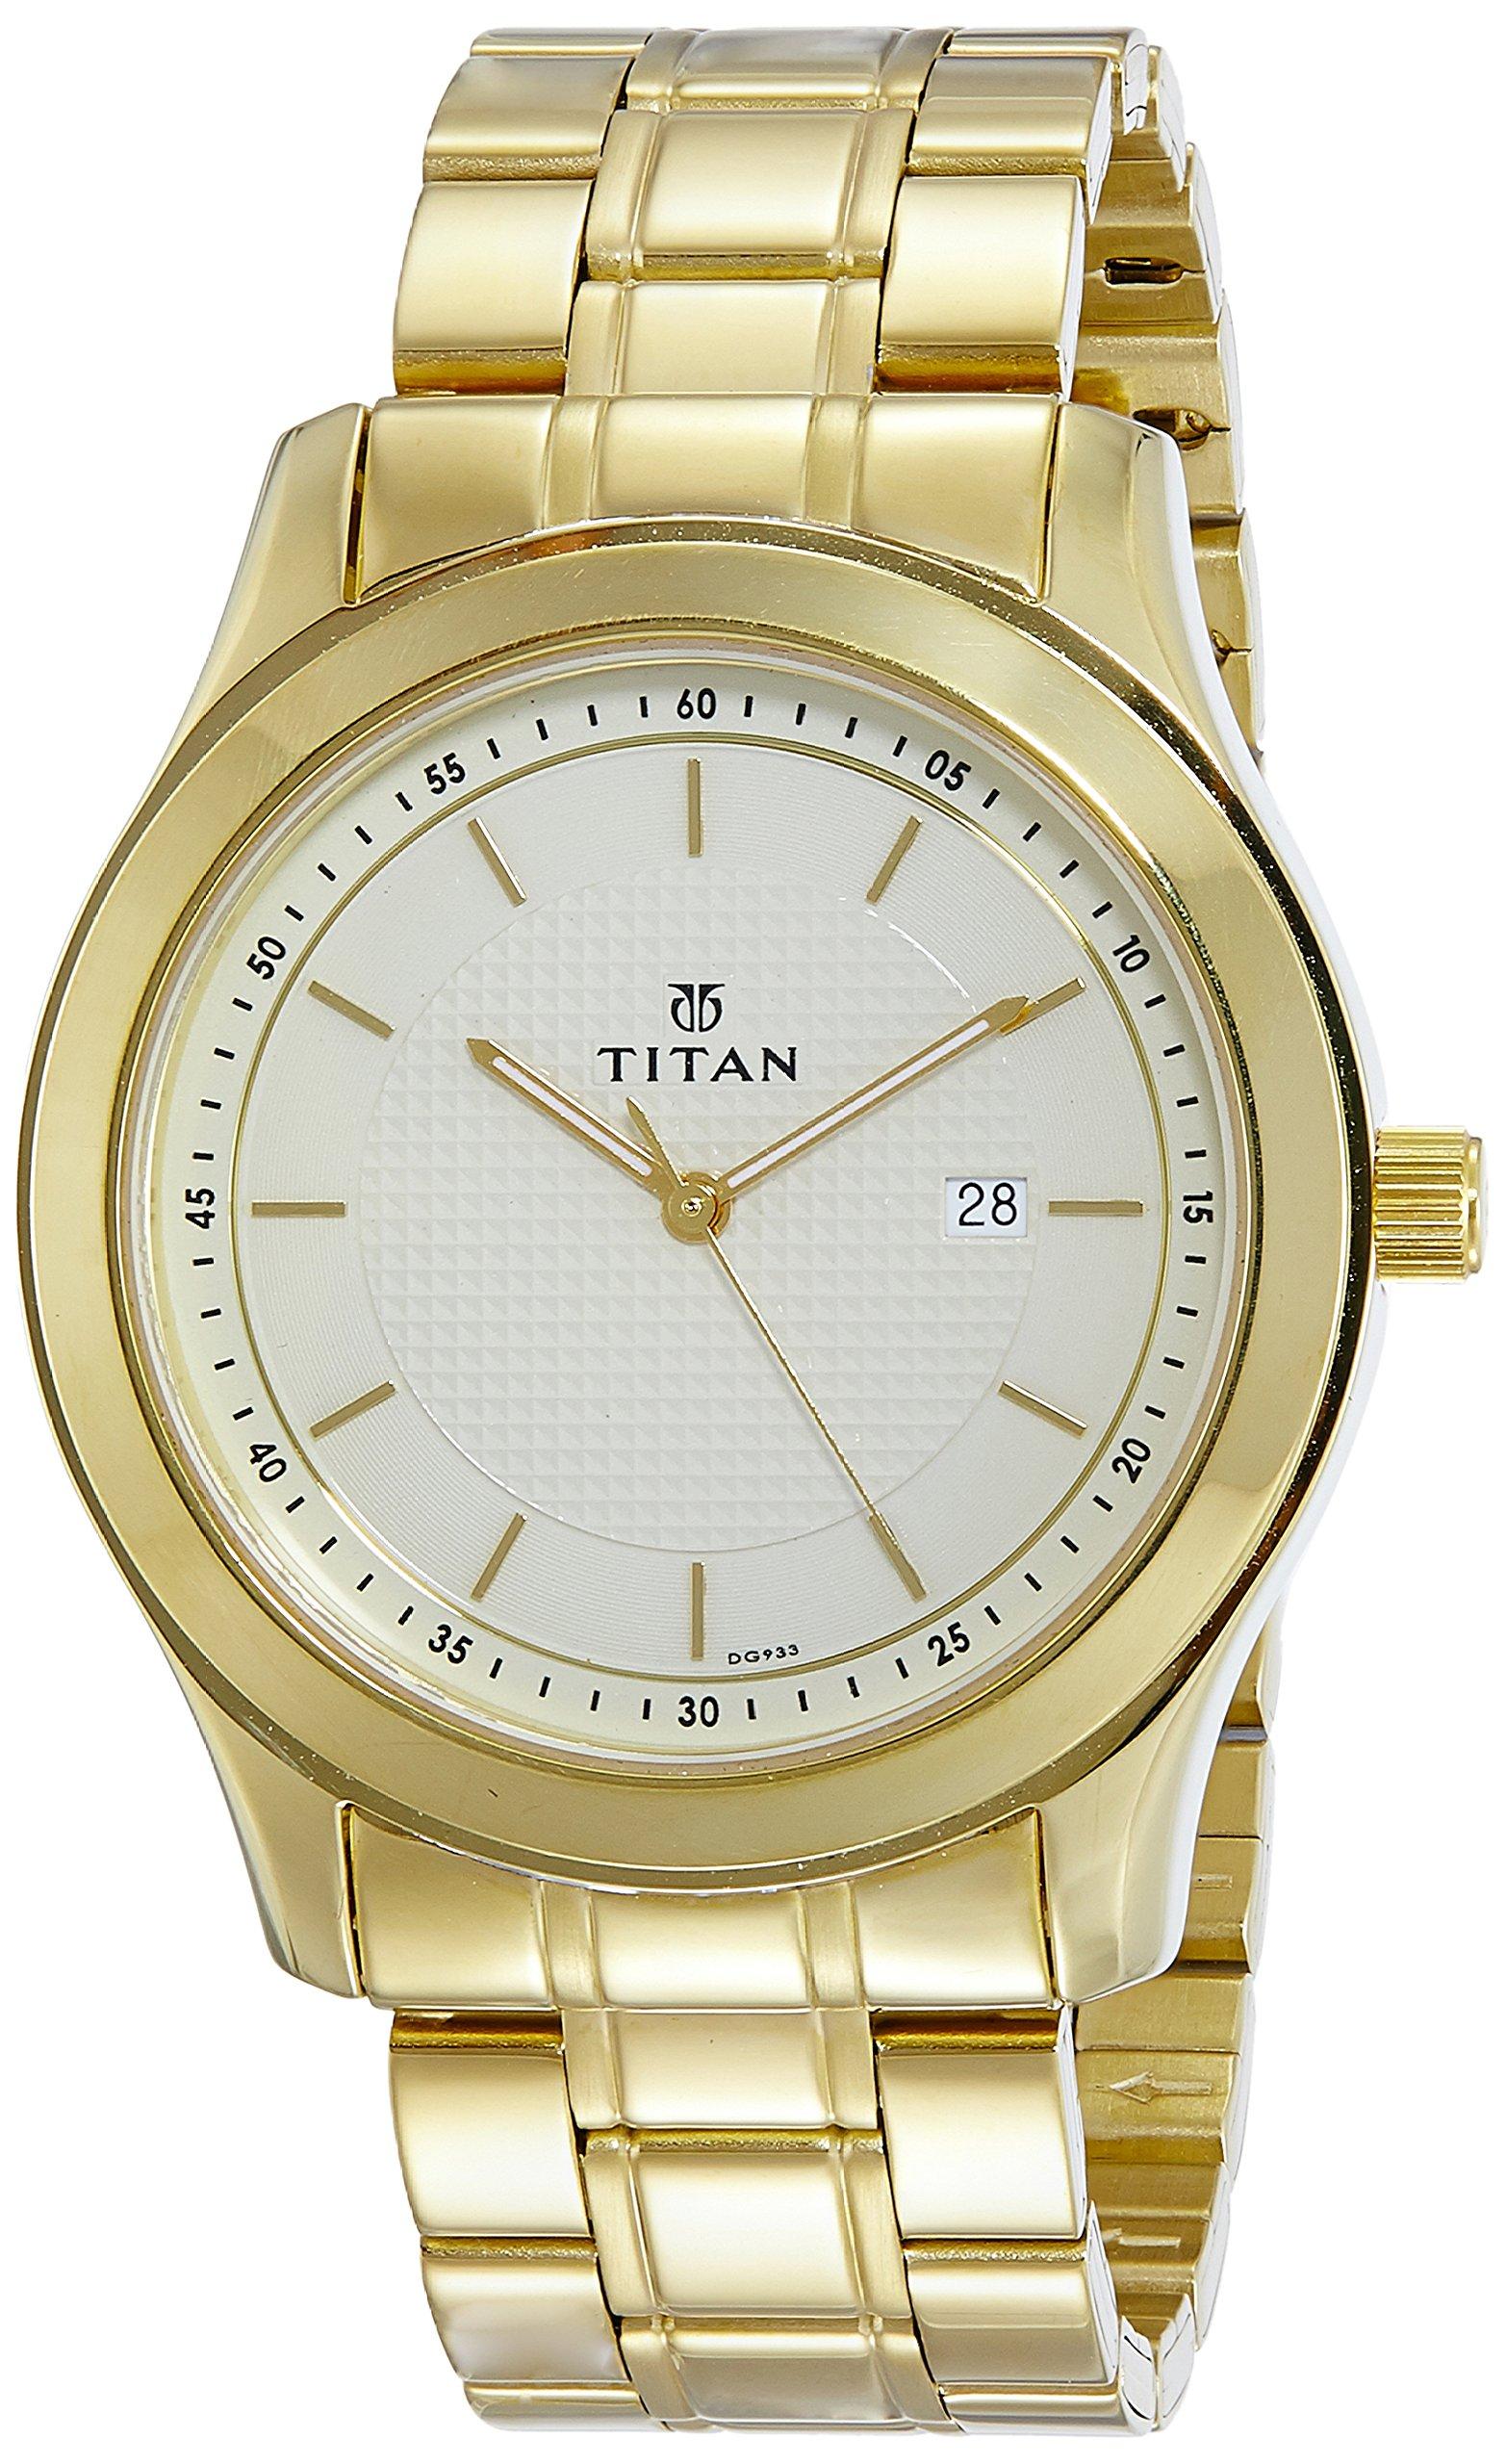 Titan Regalia Baron Analog Champagne Dial Men's Watch-1627YM04 (B077YDPBN4) Amazon Price History, Amazon Price Tracker